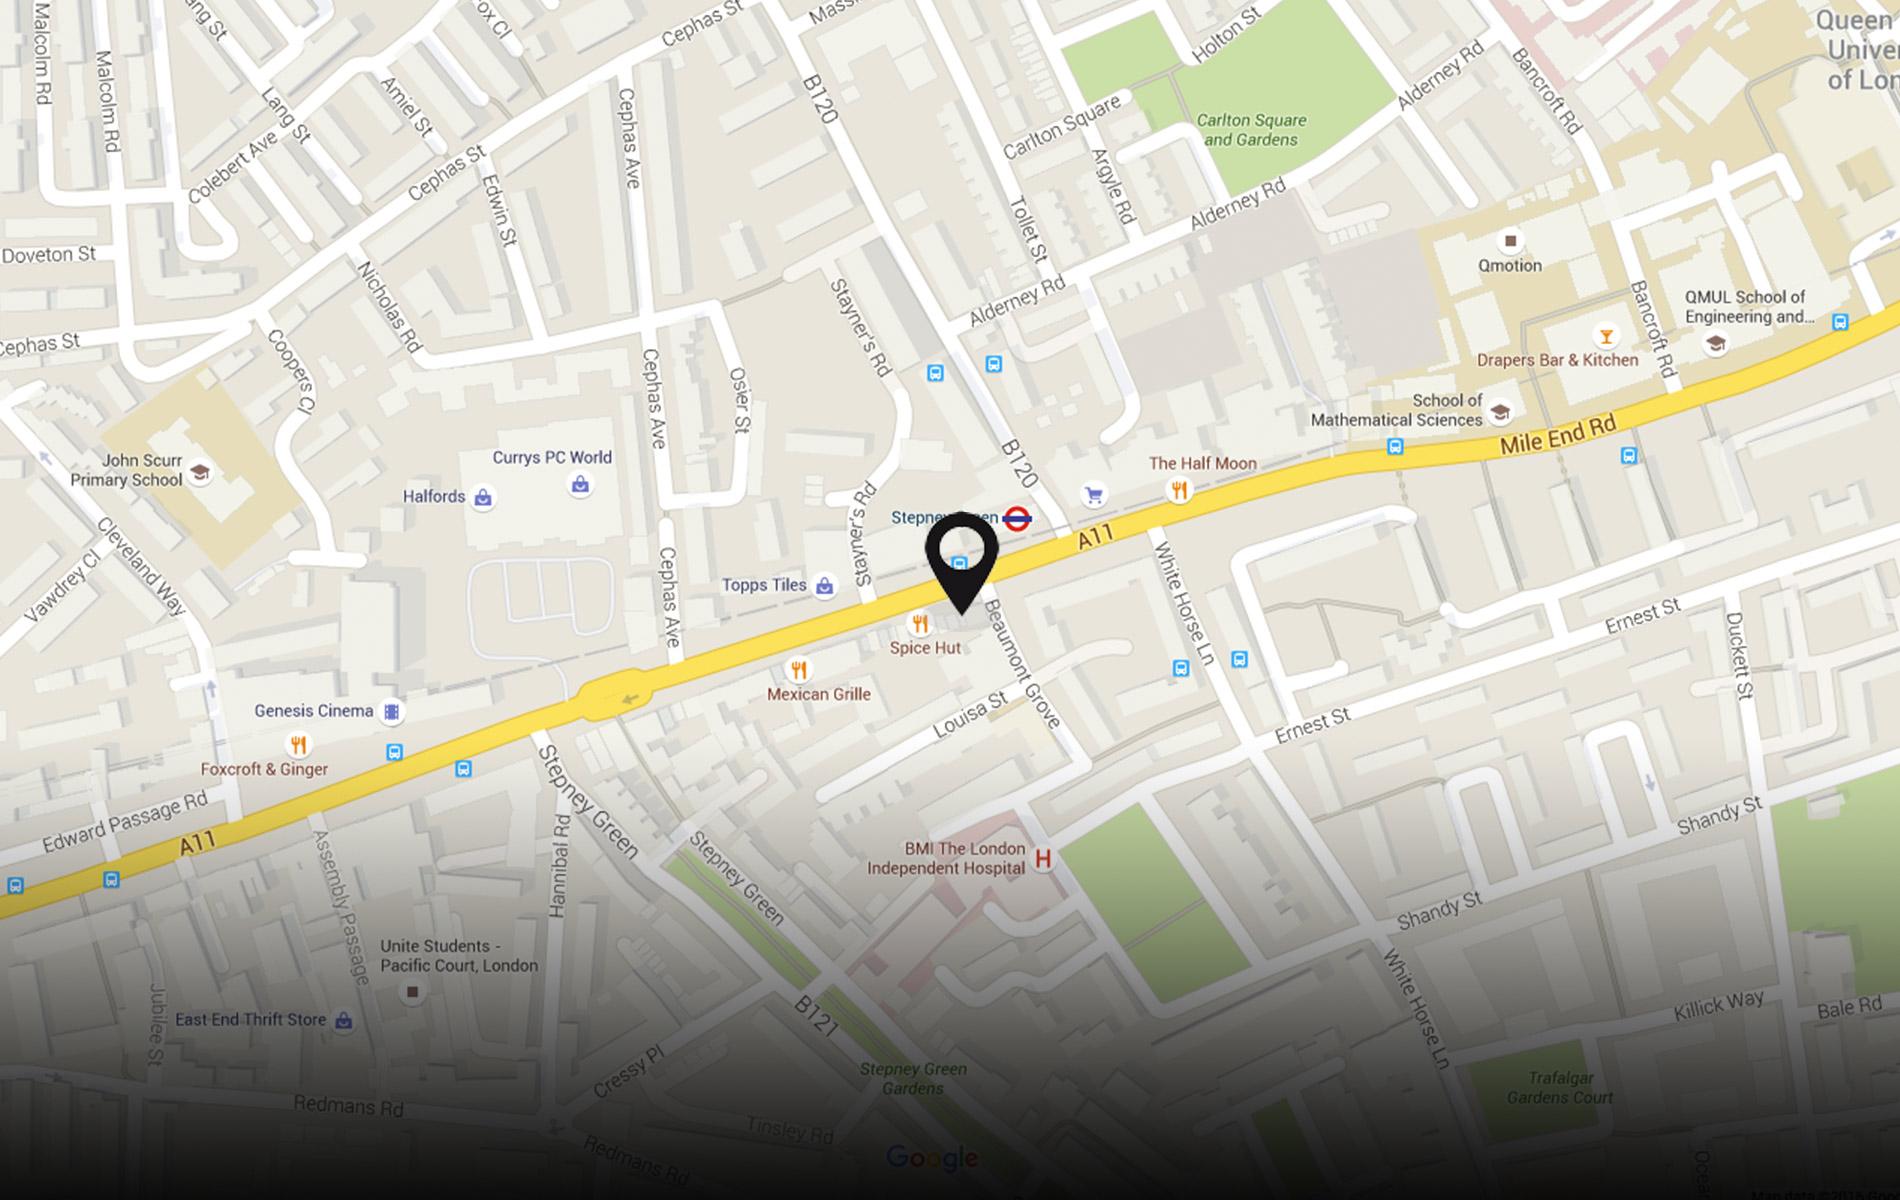 230 Mile End Road, London E1 4LJ / 0207 790 8890